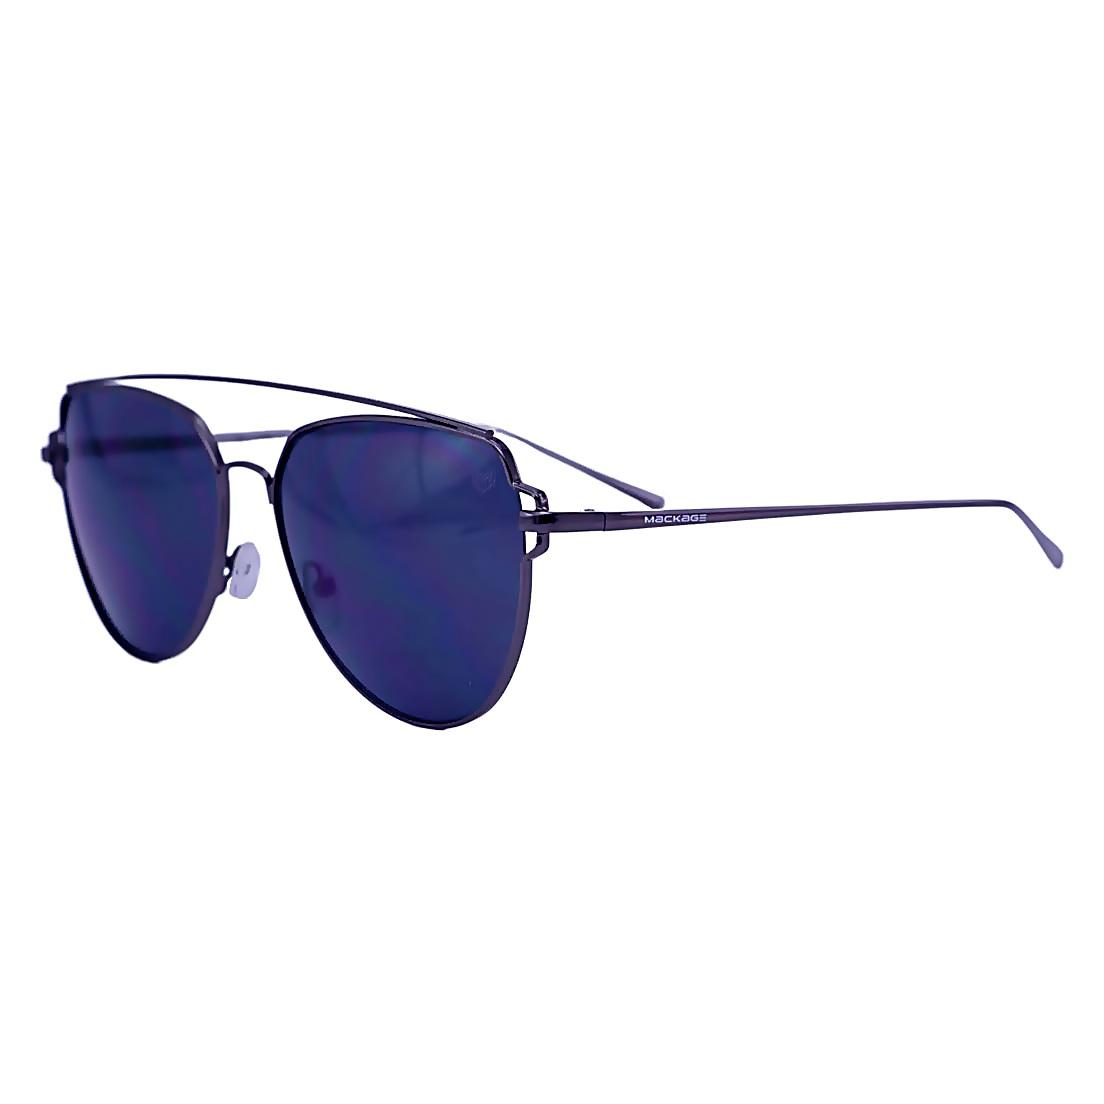 Óculos De Sol Mackage Unissex Metal Aviator - Grafite